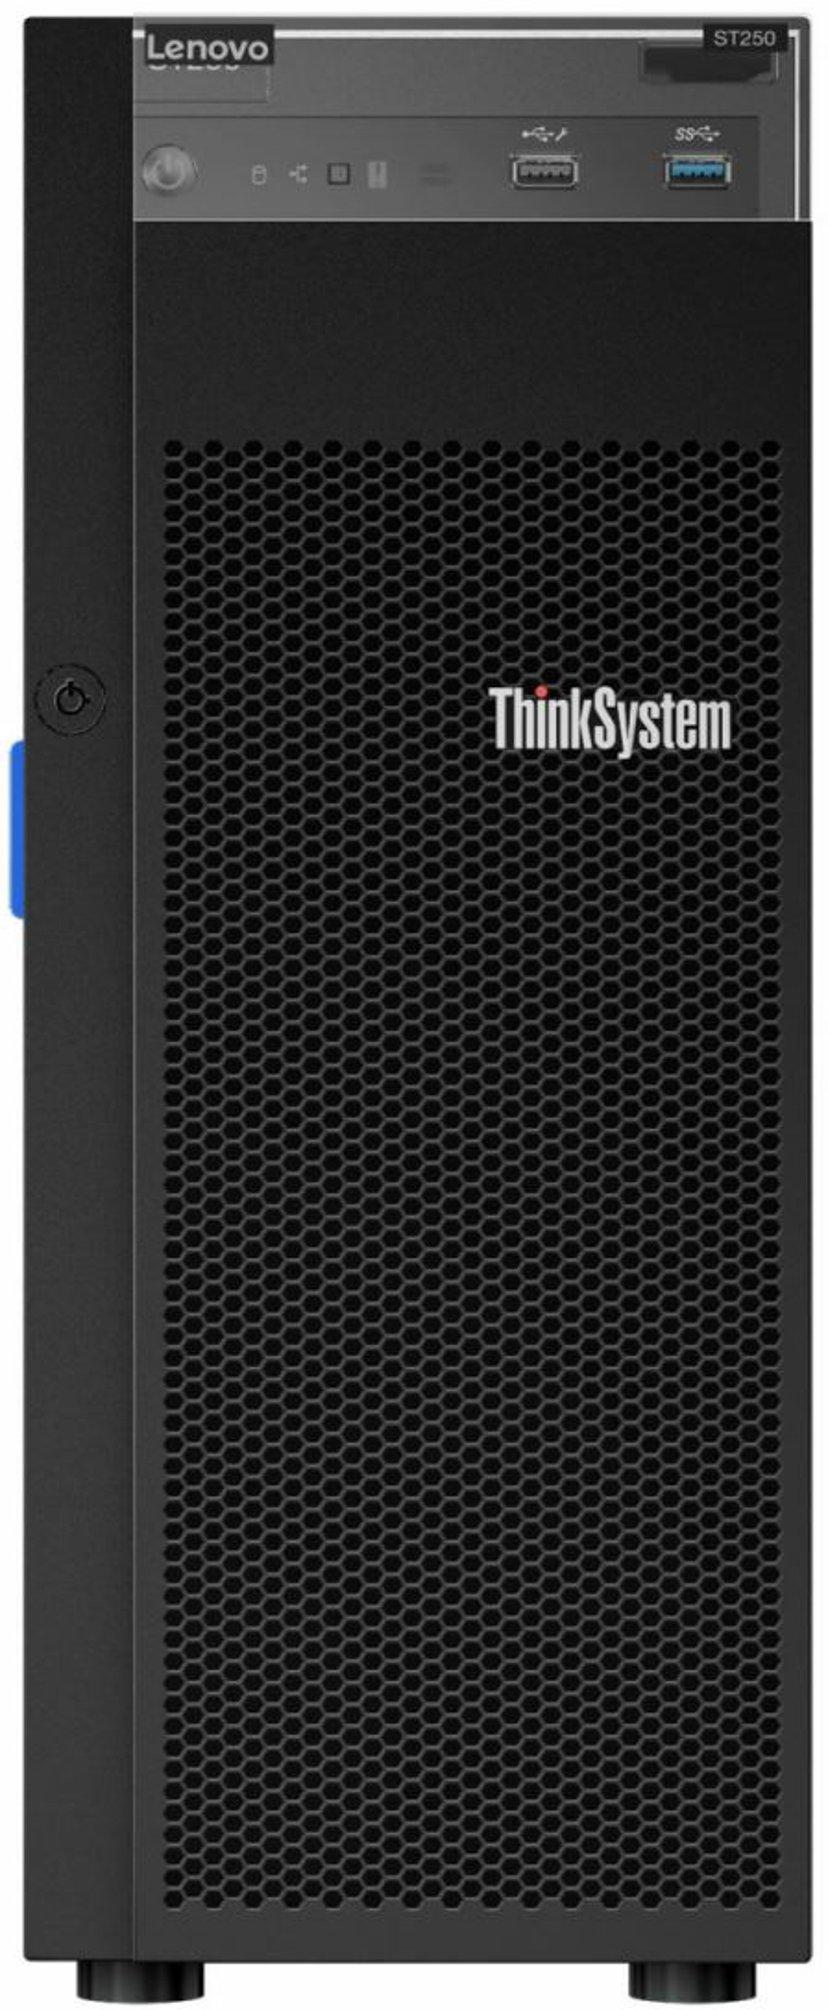 Lenovo ThinkSystem ST250 Xeon Quad-Core 16GB